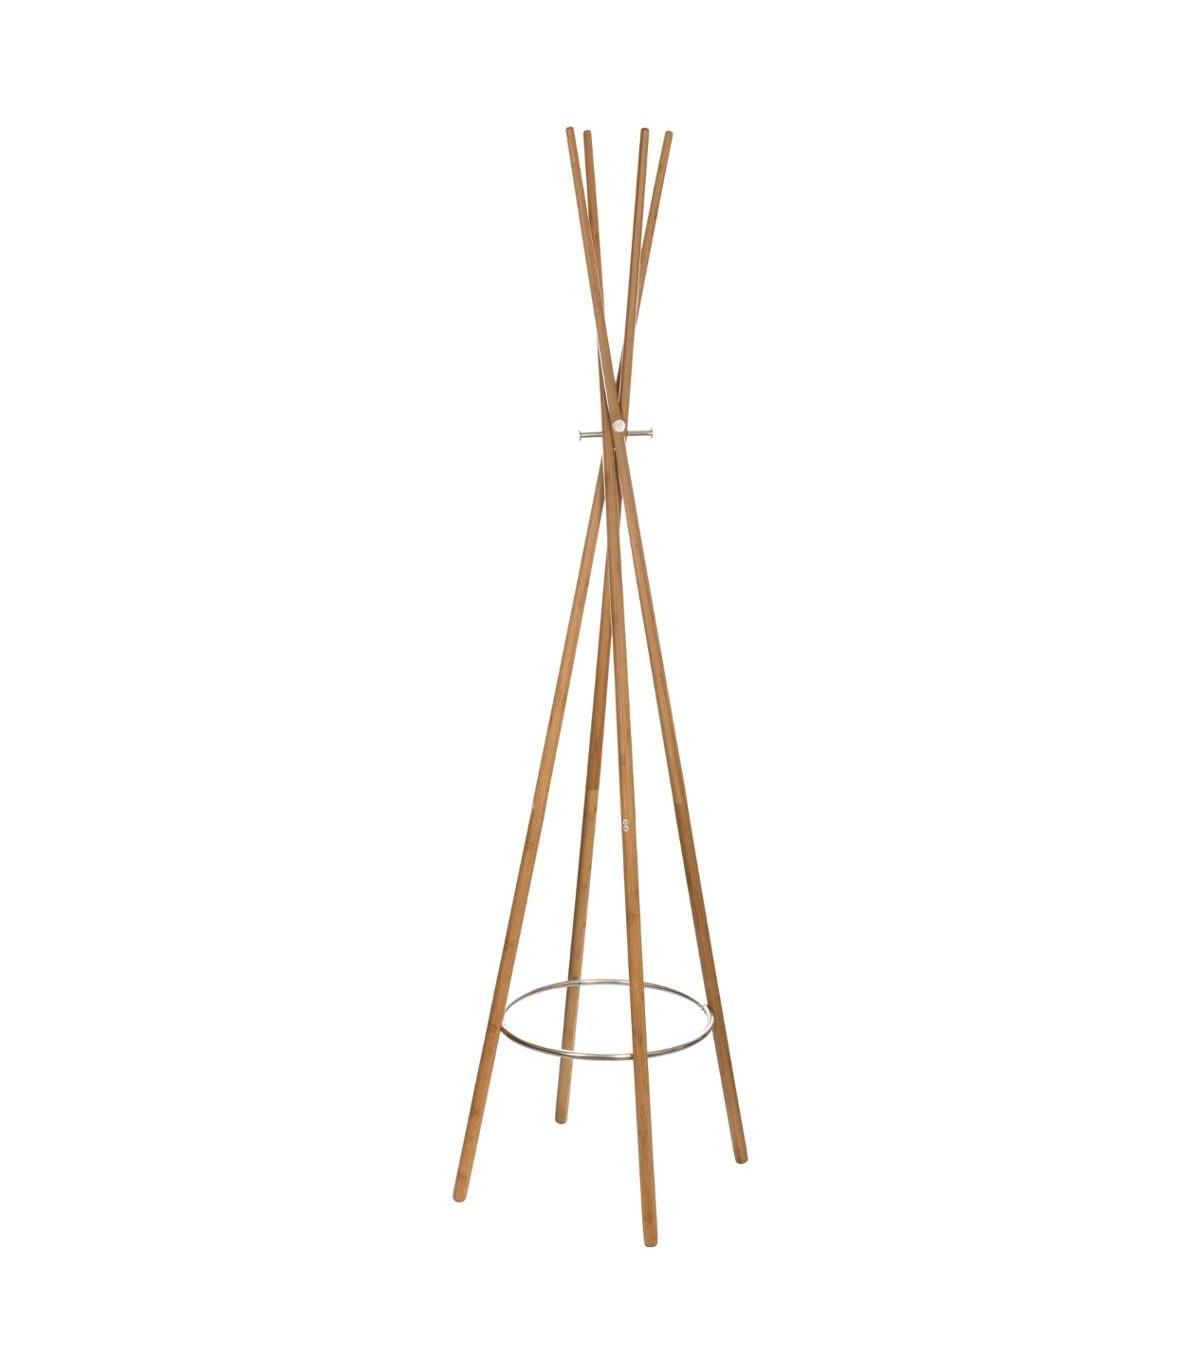 Porte-manteaux en bambou 8 tiges TIPI